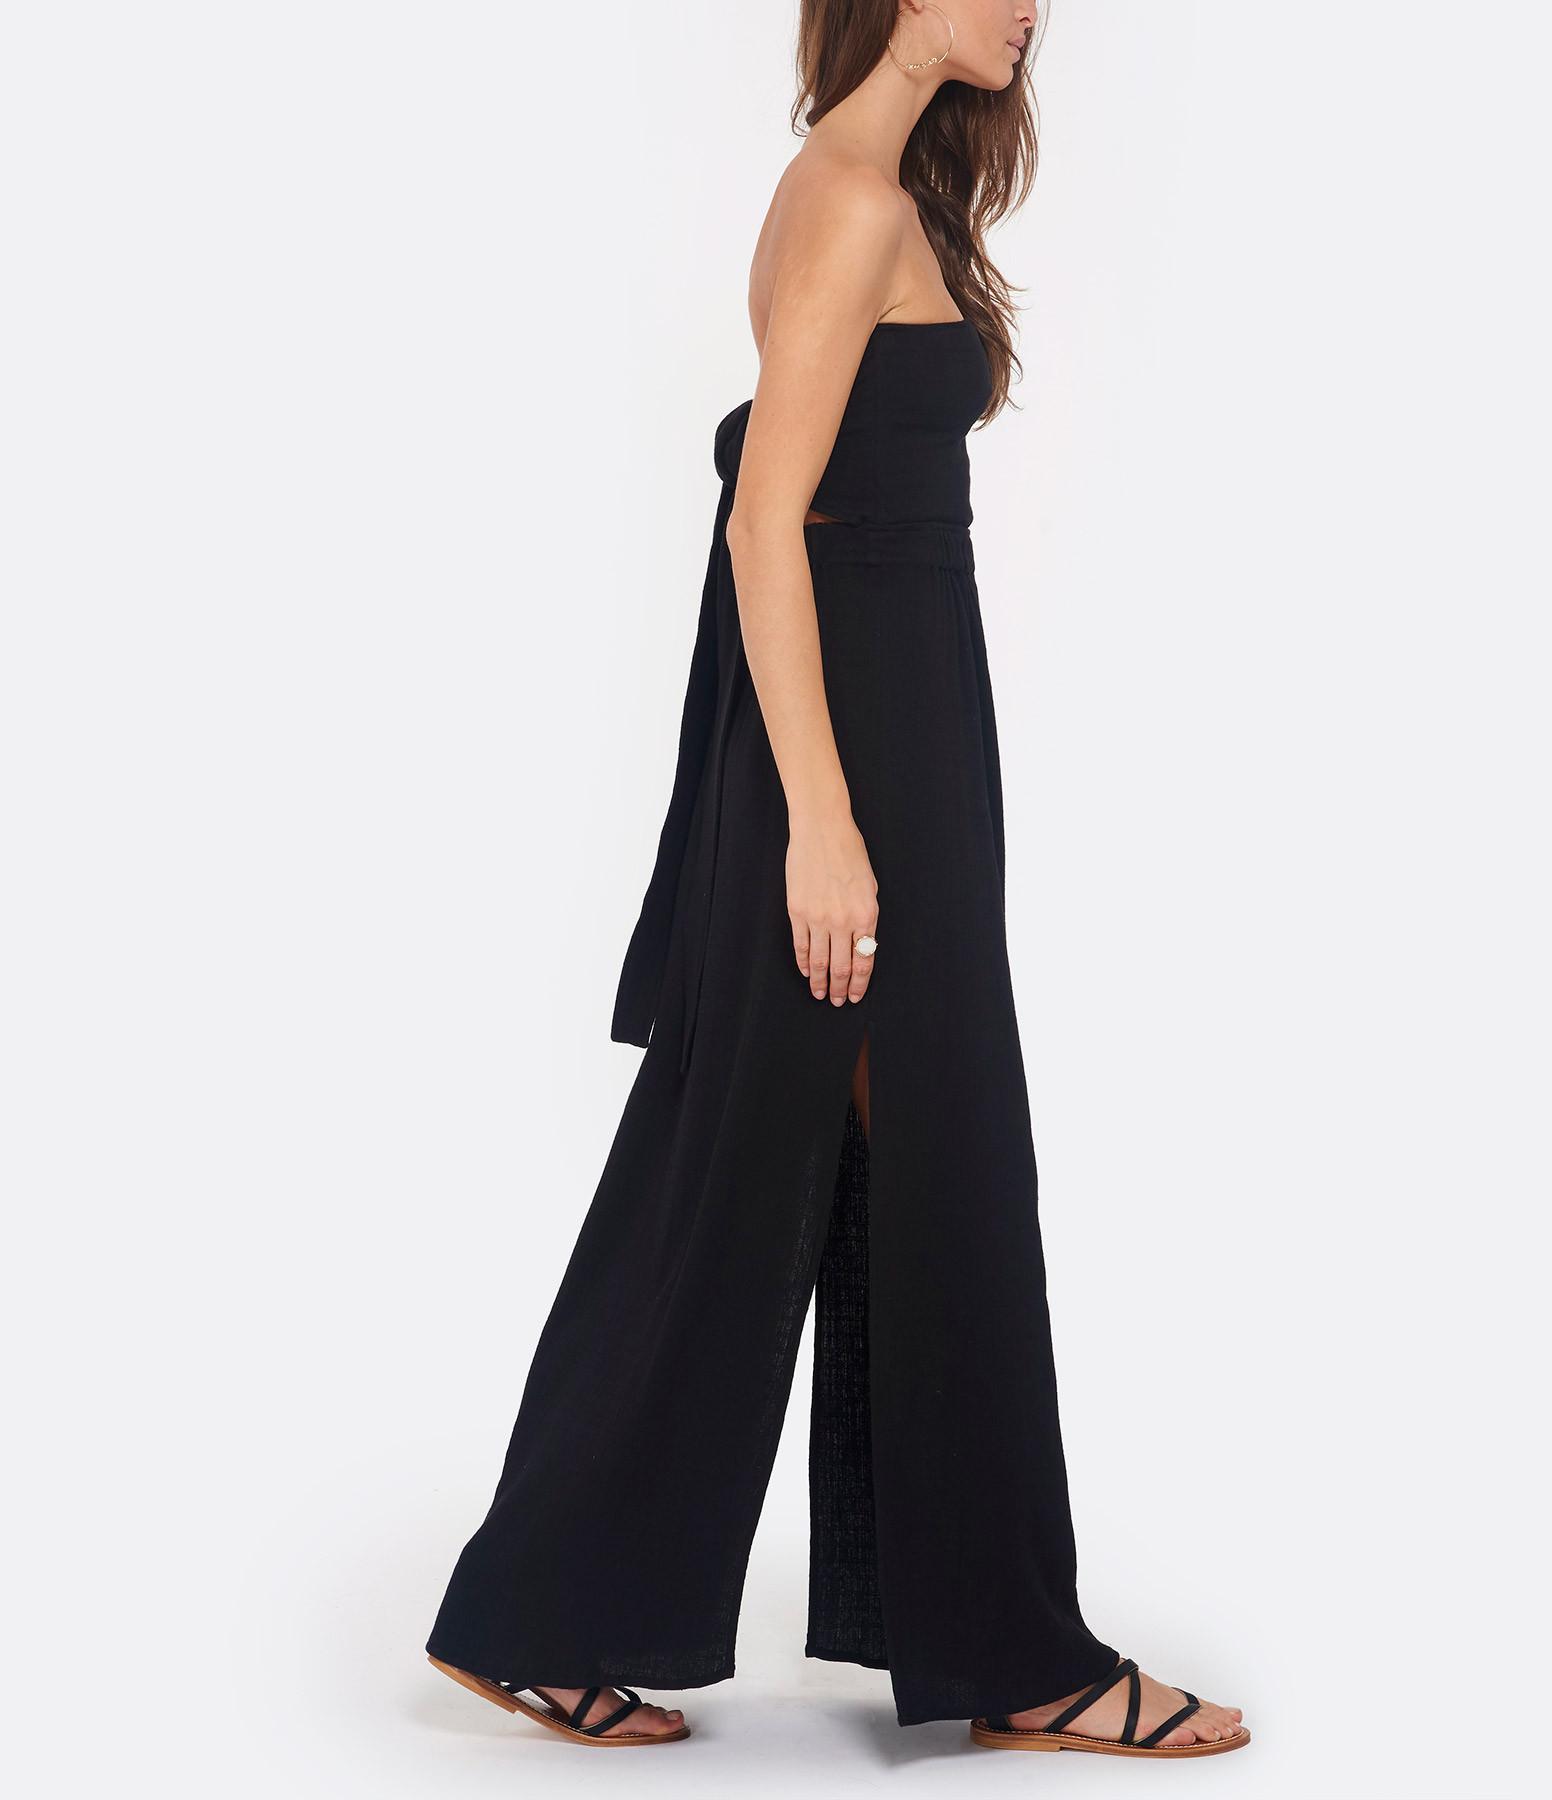 Robe Noir Longue Coton Hanita Misty sthQrCodxB